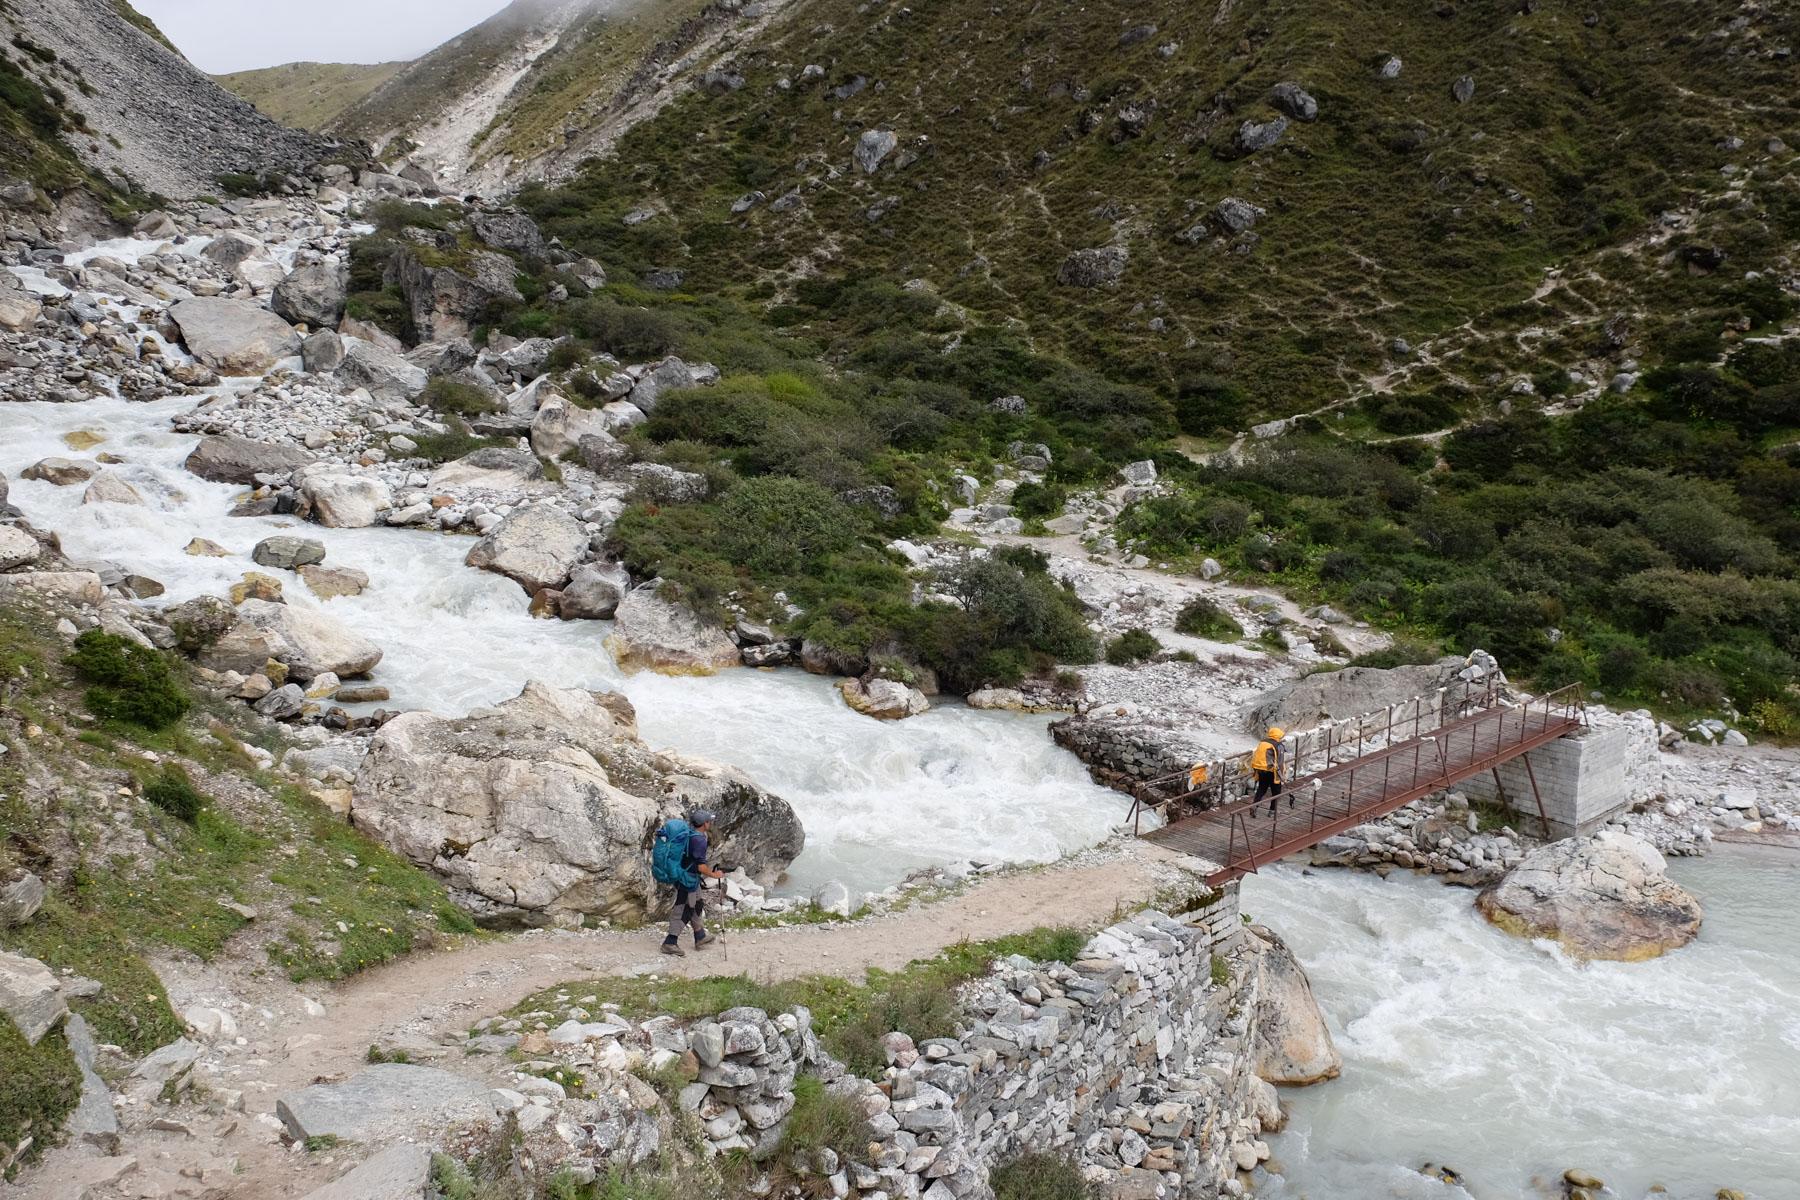 Everest Base Camp, Everest 3 pass #2 18